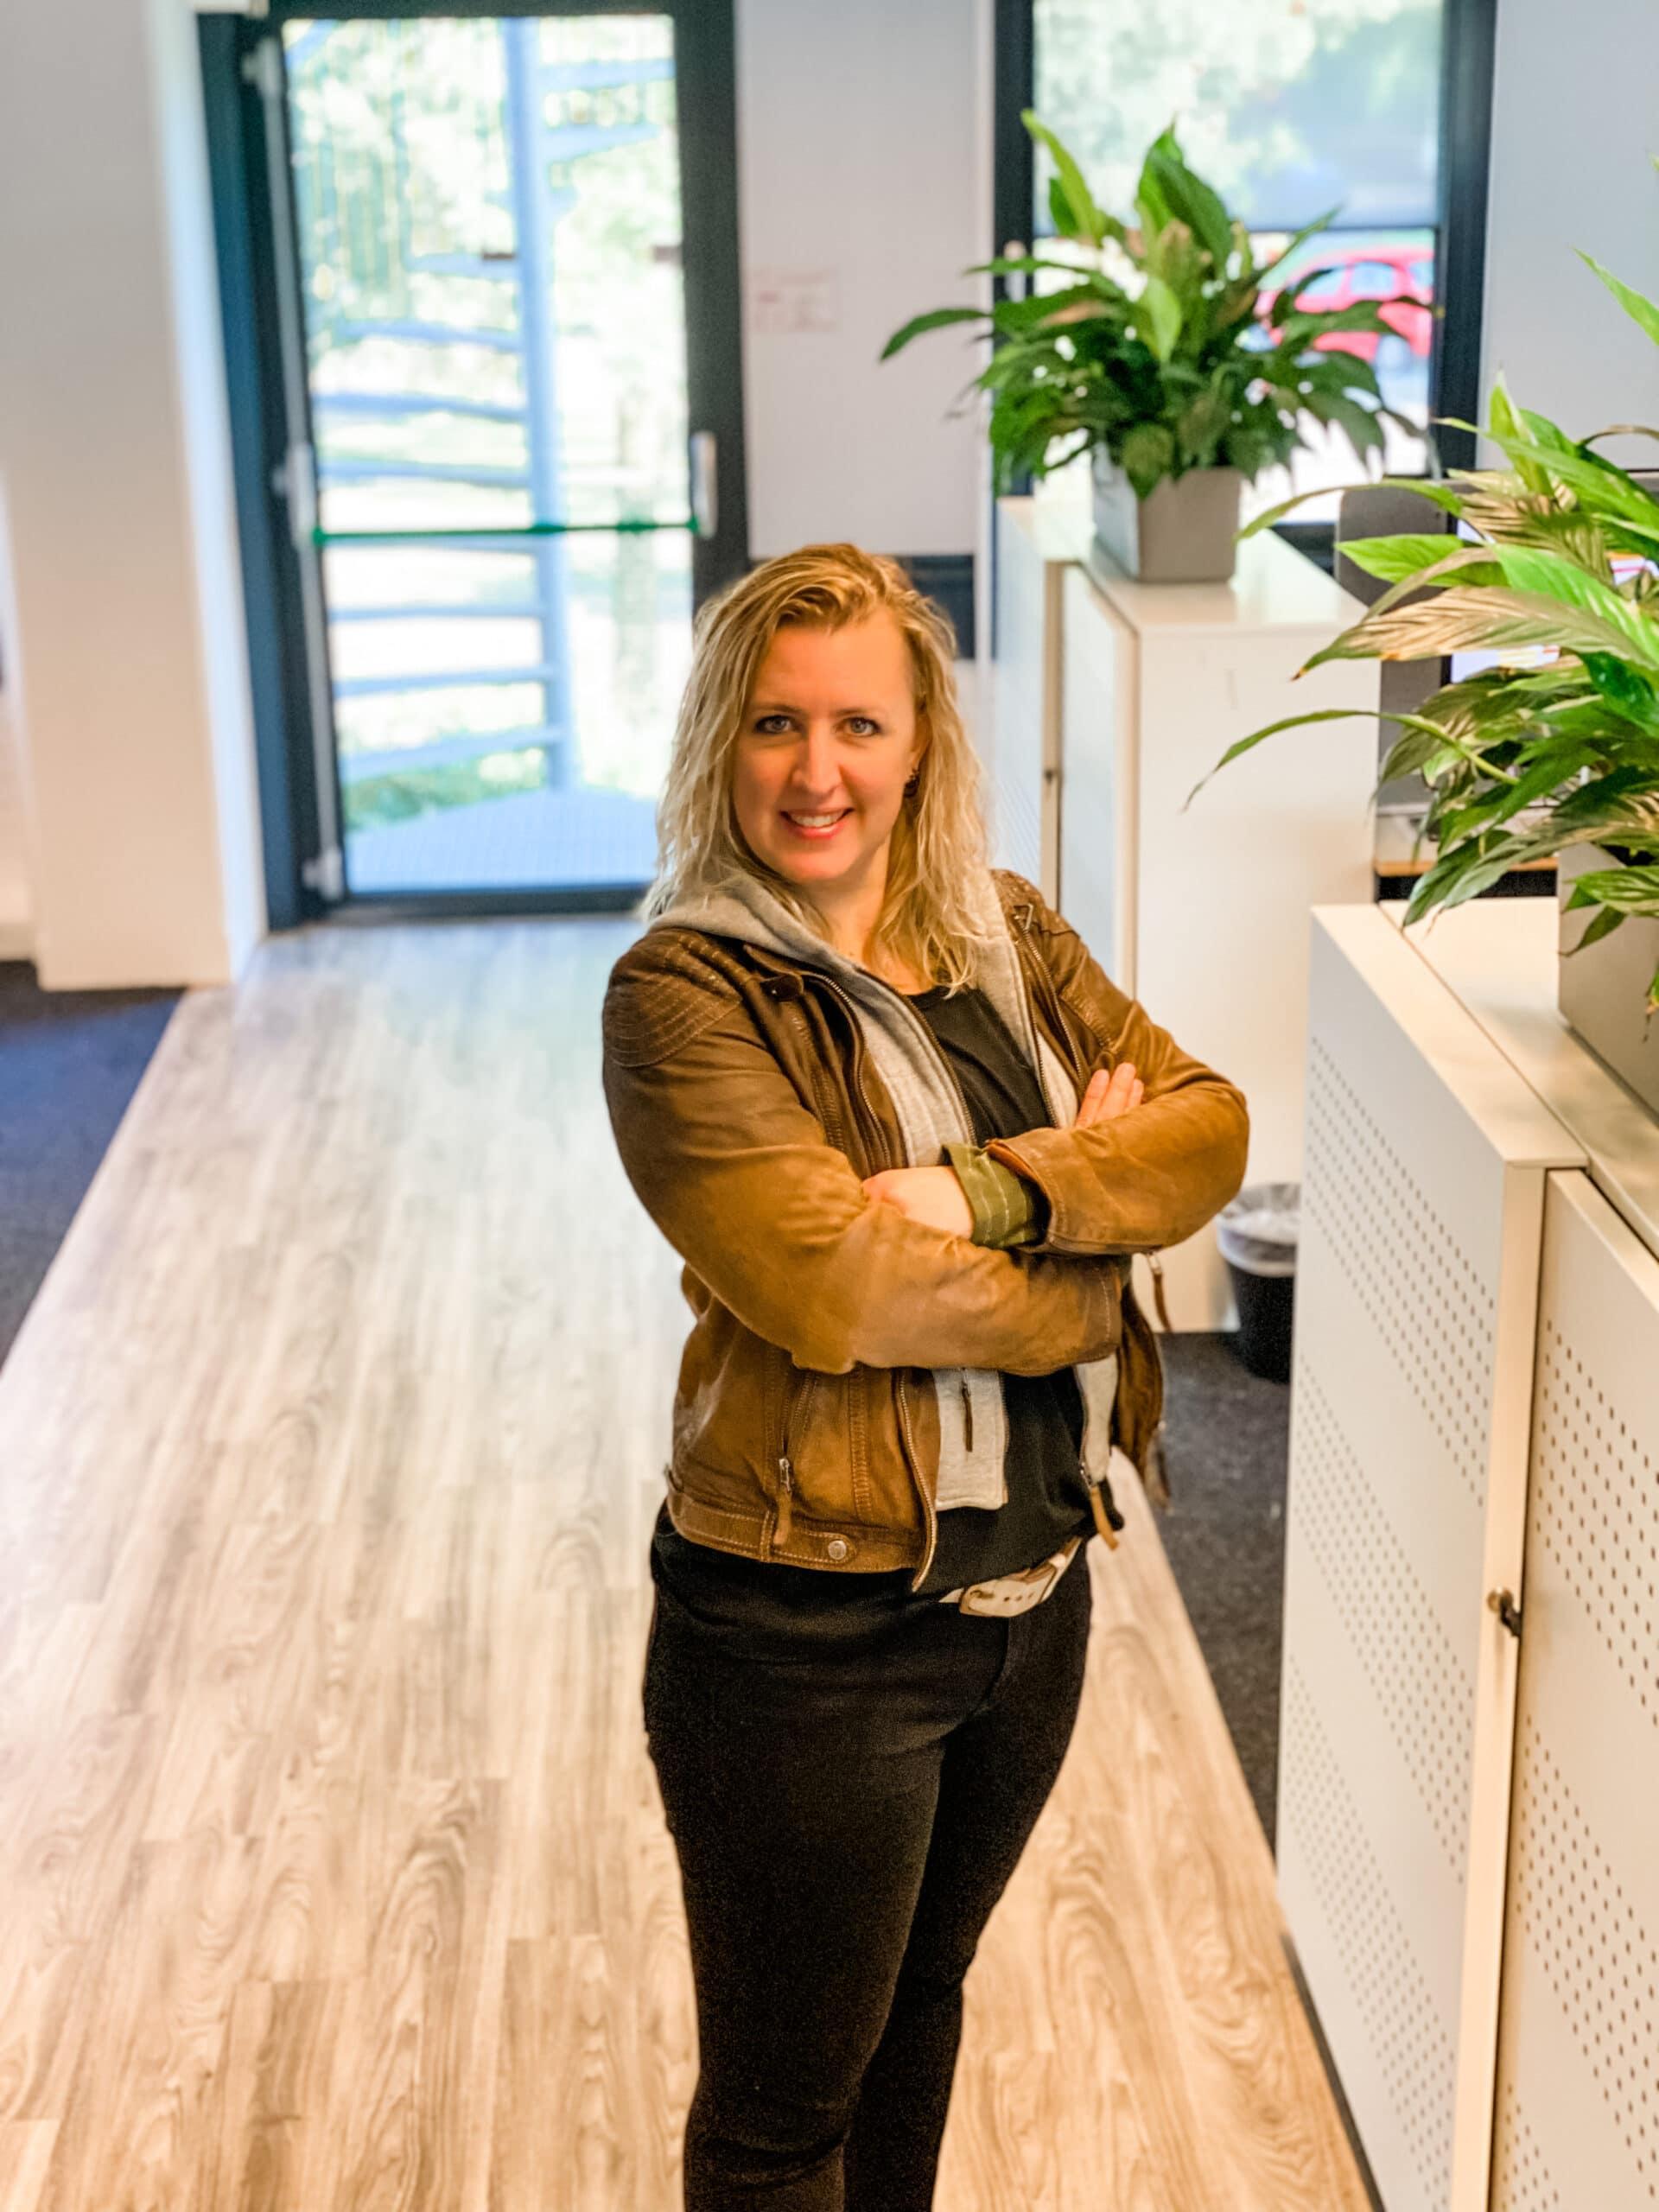 Annemarie Hoekstra marketeer bij Quality Contacts visual lachende vrouw